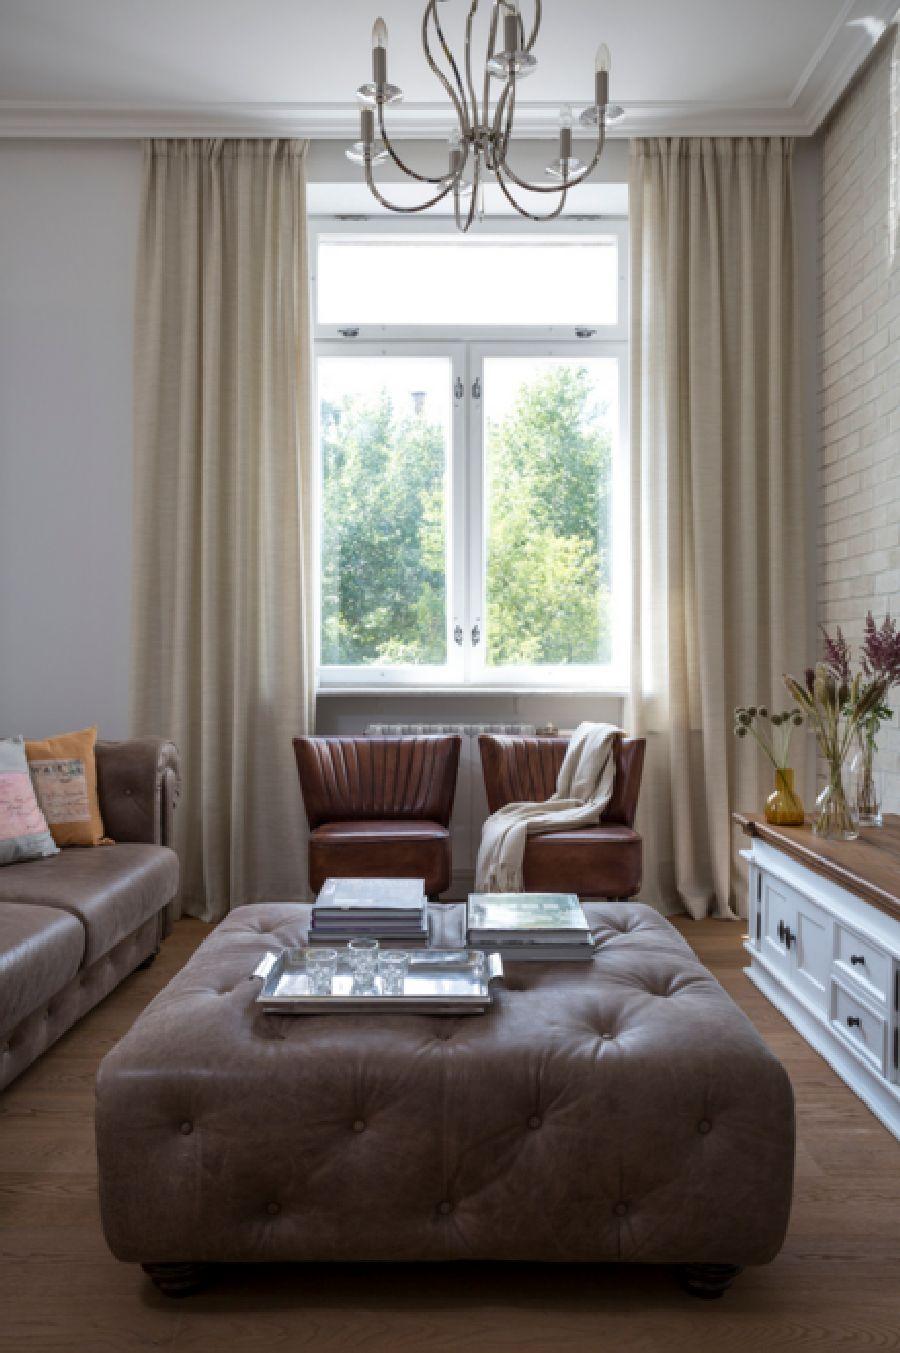 adelaparvu.com despre apartament de 80 mp patrati cu aer rustic elegant, locuinta Rusia, designer Zhenya Zhdanova (9)